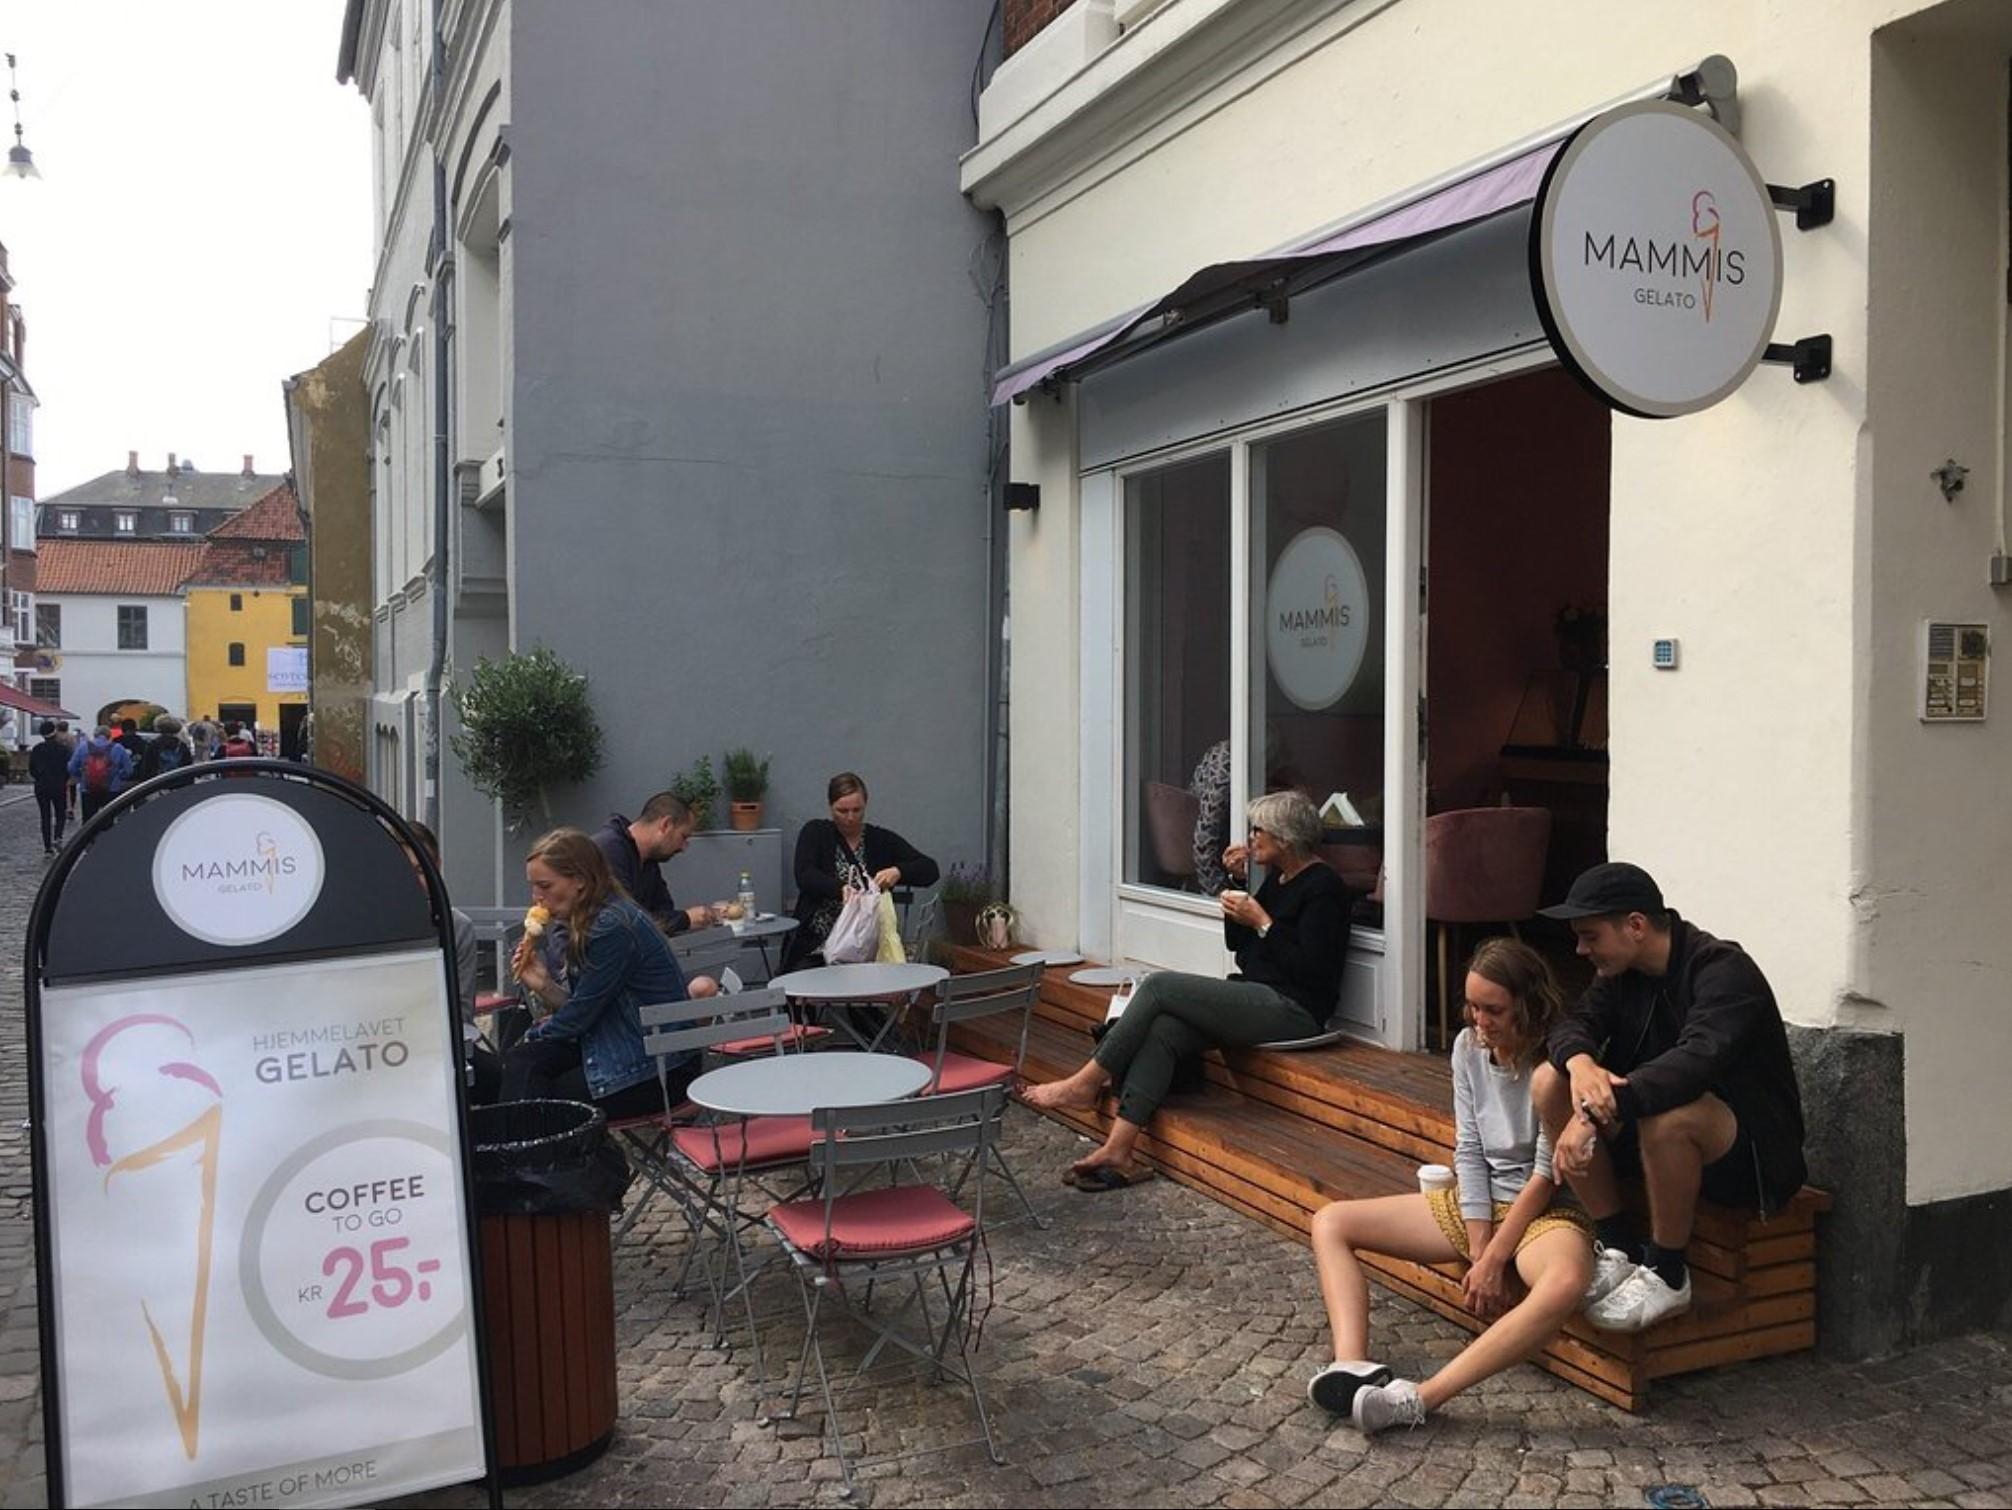 Mammi's Denmark